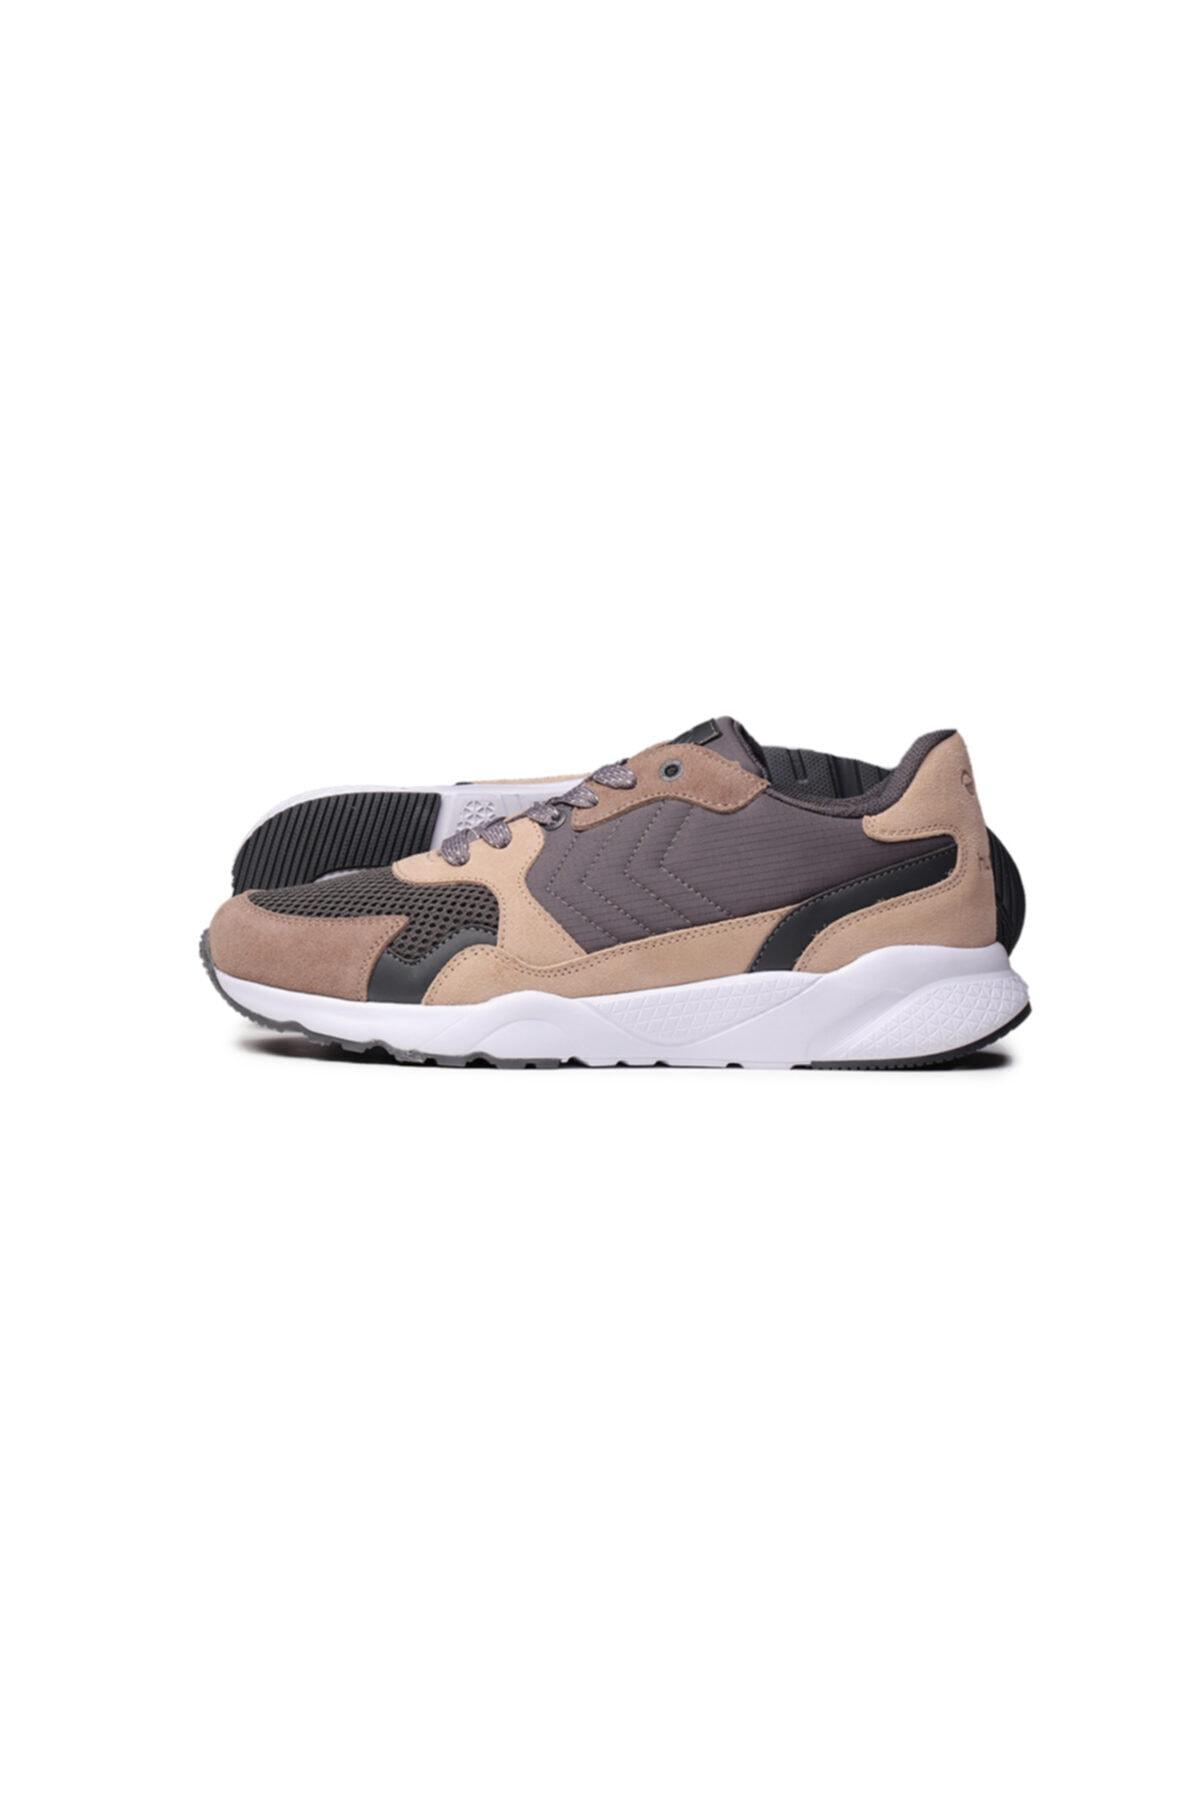 HUMMEL Norma Lıfestyle Shoes 1